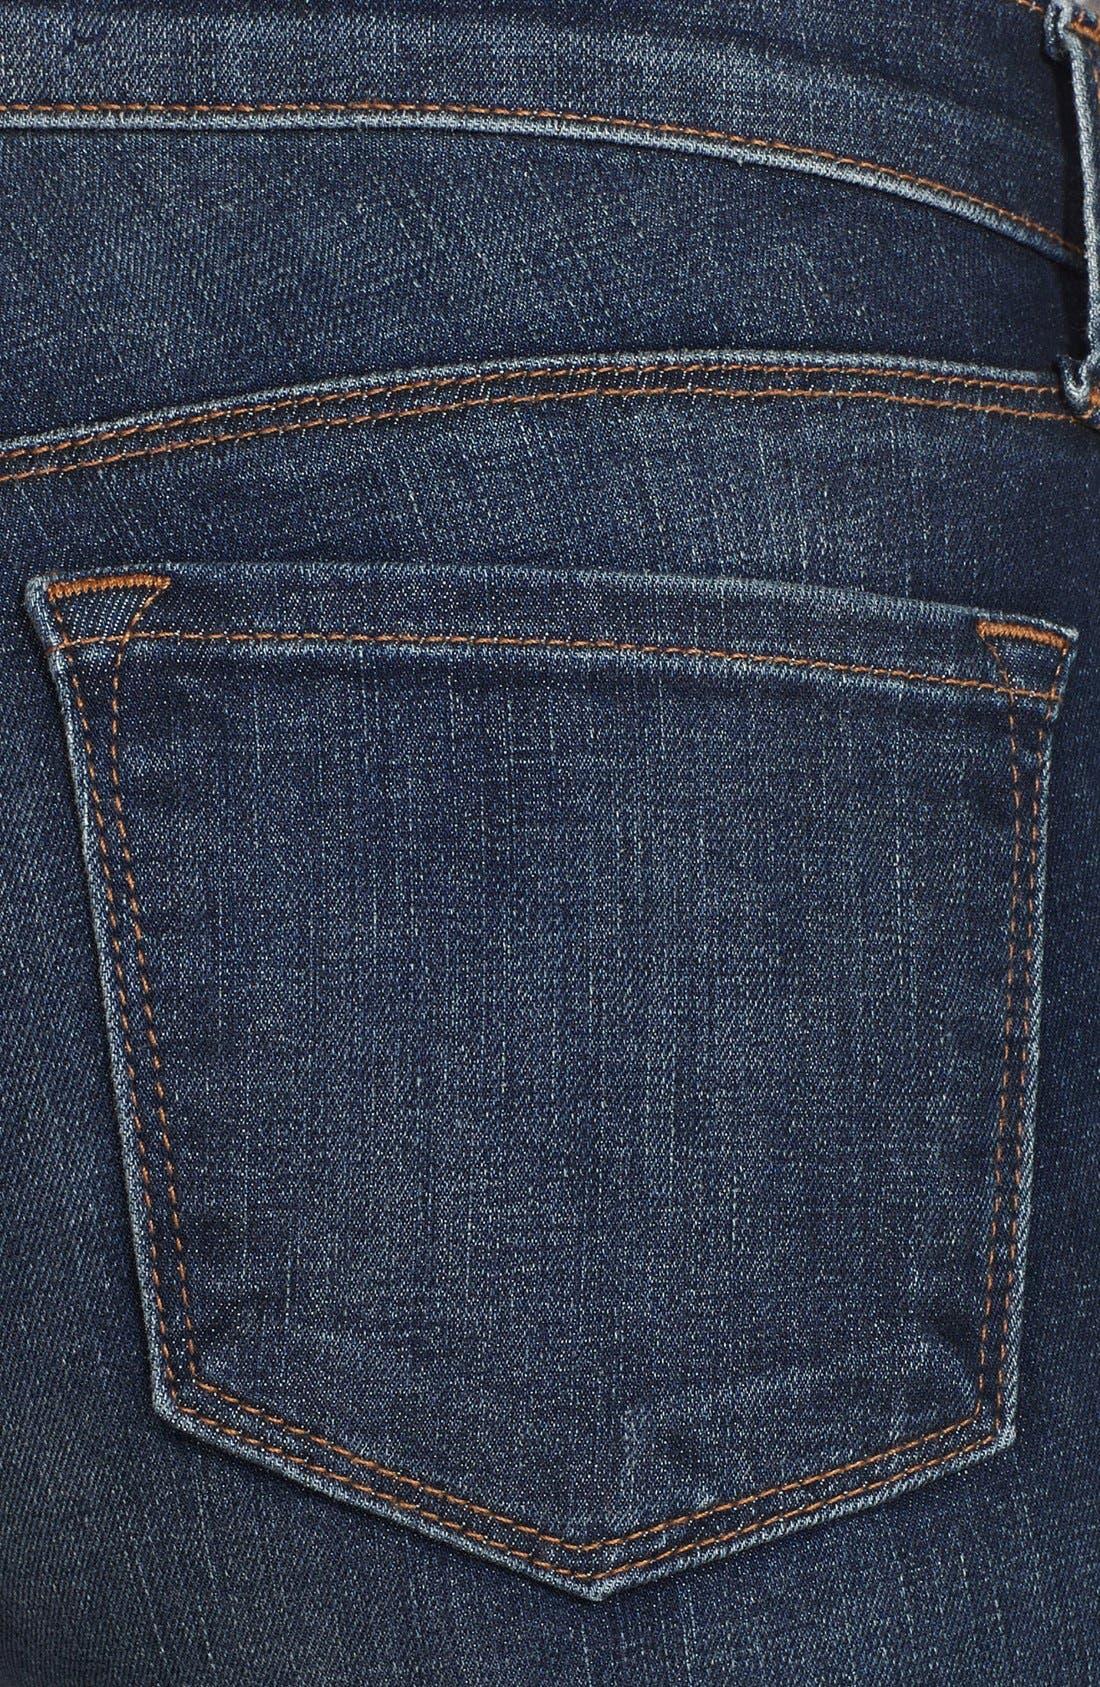 Alternate Image 2  - J Brand Mid Rise Skinny Jeans (Waltz)